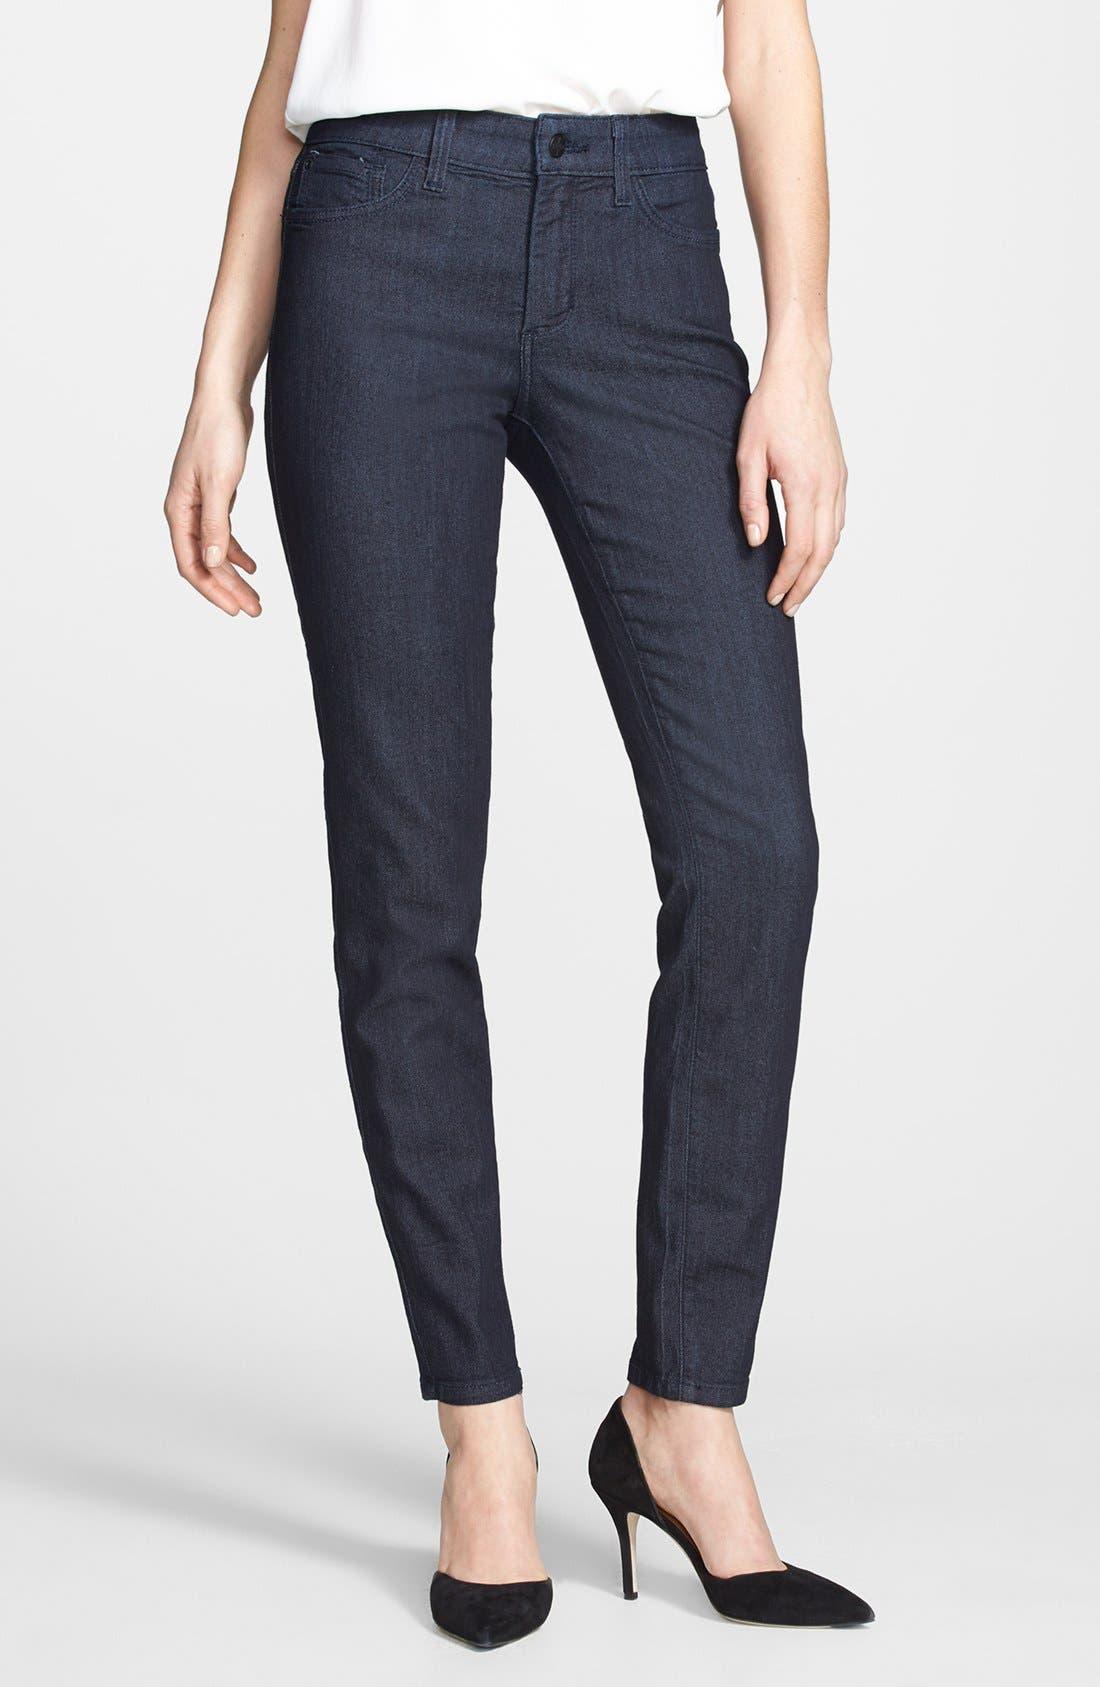 Alternate Image 1 Selected - NYDJ 'Ami' Tonal Stitch Stretch Skinny Jeans (Dark Enzyme) (Regular & Petite)